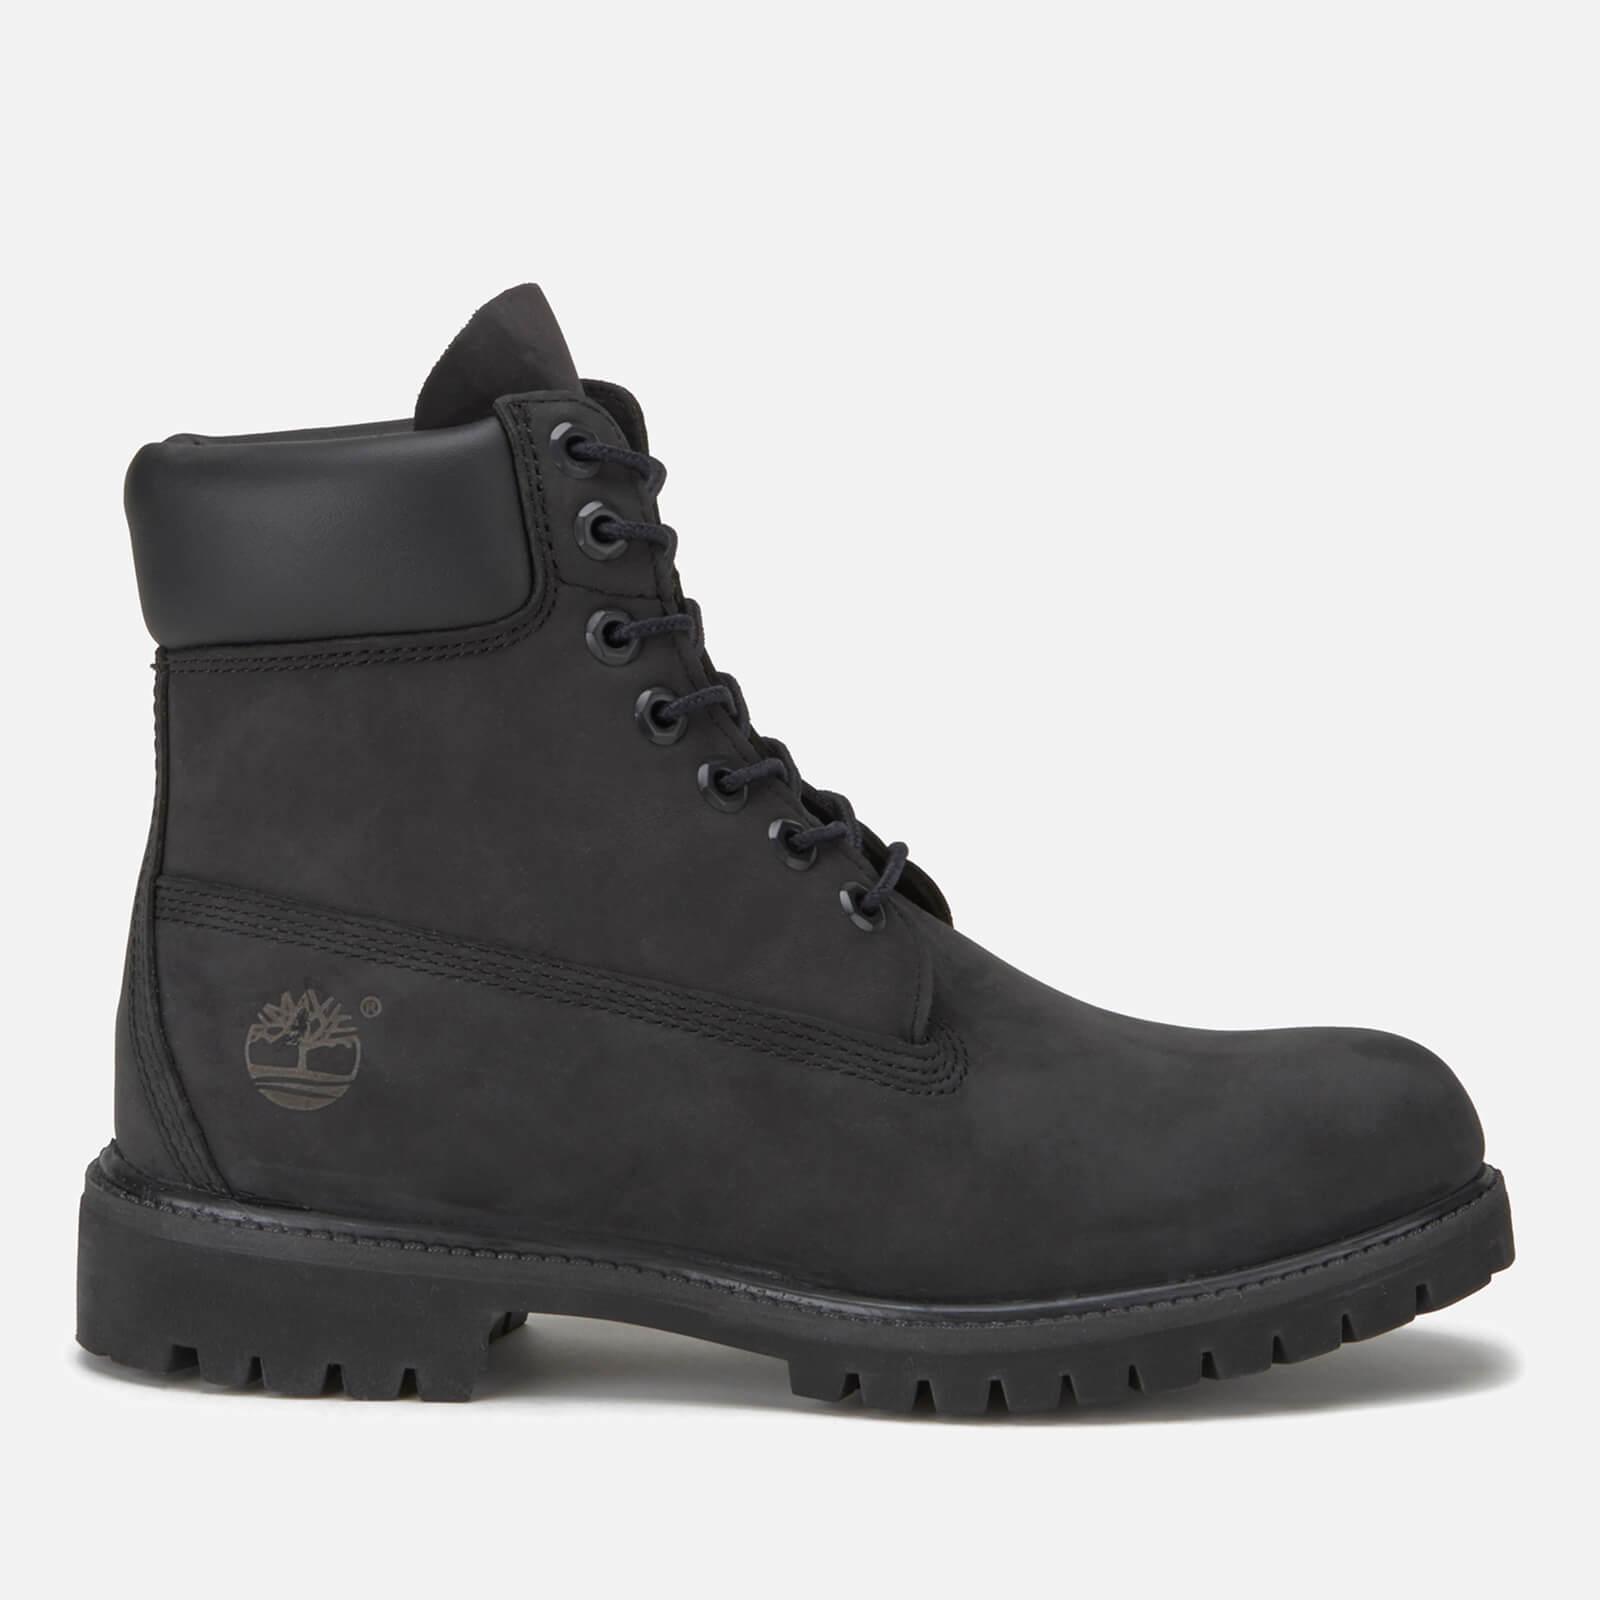 214d4f4365f1e1 Timberland Men s 6 Inch Nubuck Premium Boots - Black